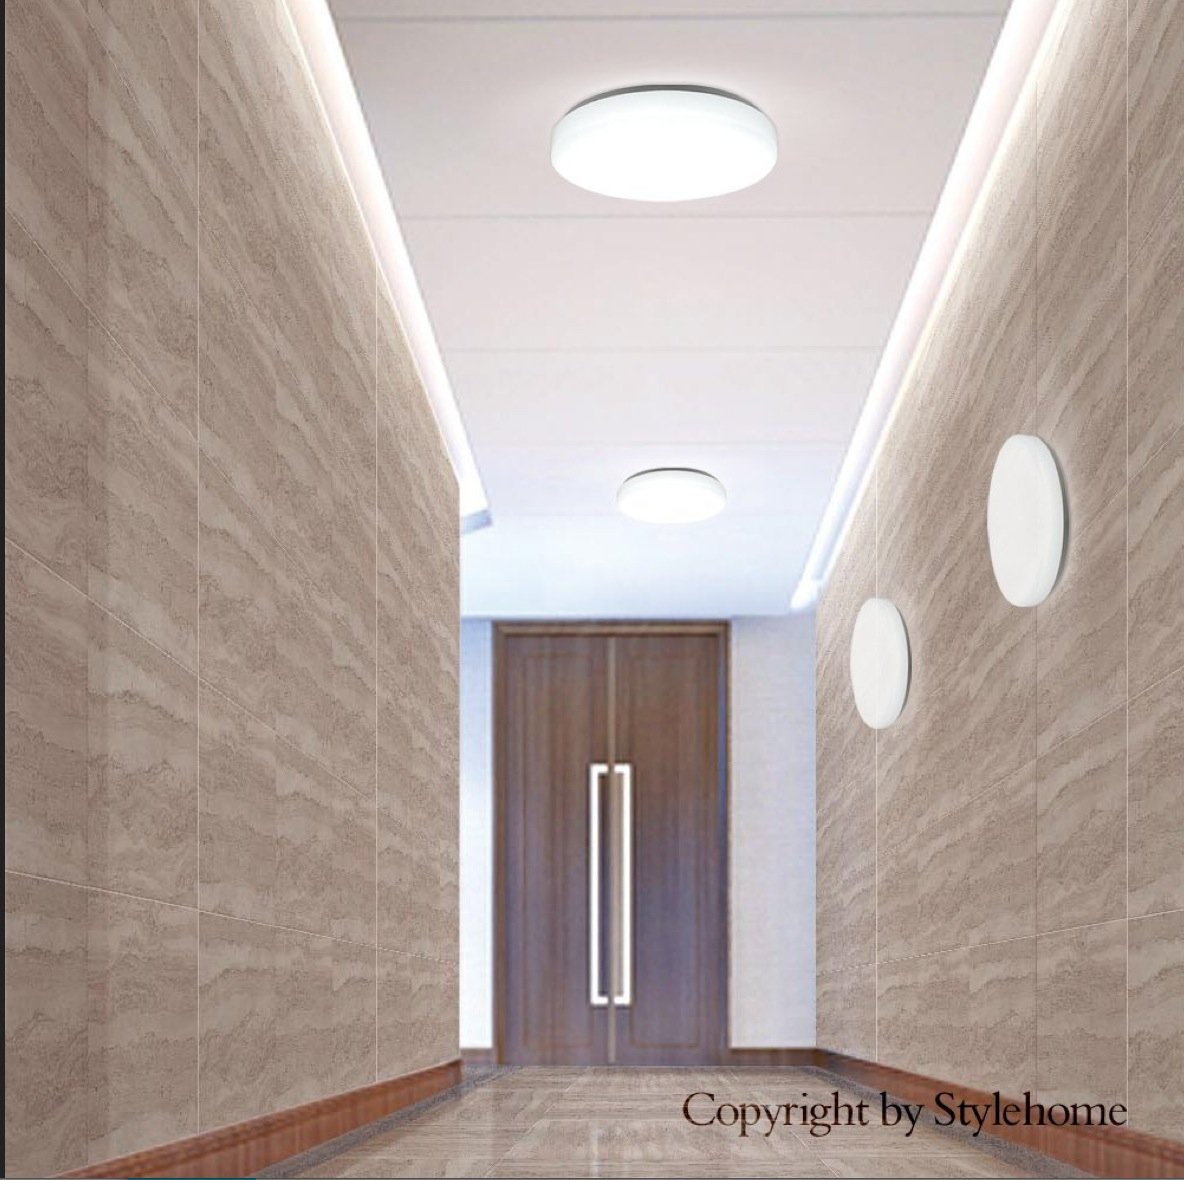 Latest Style Home Led Deckenlampe Wandlampe Kchenlampe Diele Kche  Badezimmer Xwarmwei W Amazonde Beleuchtung With Wandlampe Badezimmer.